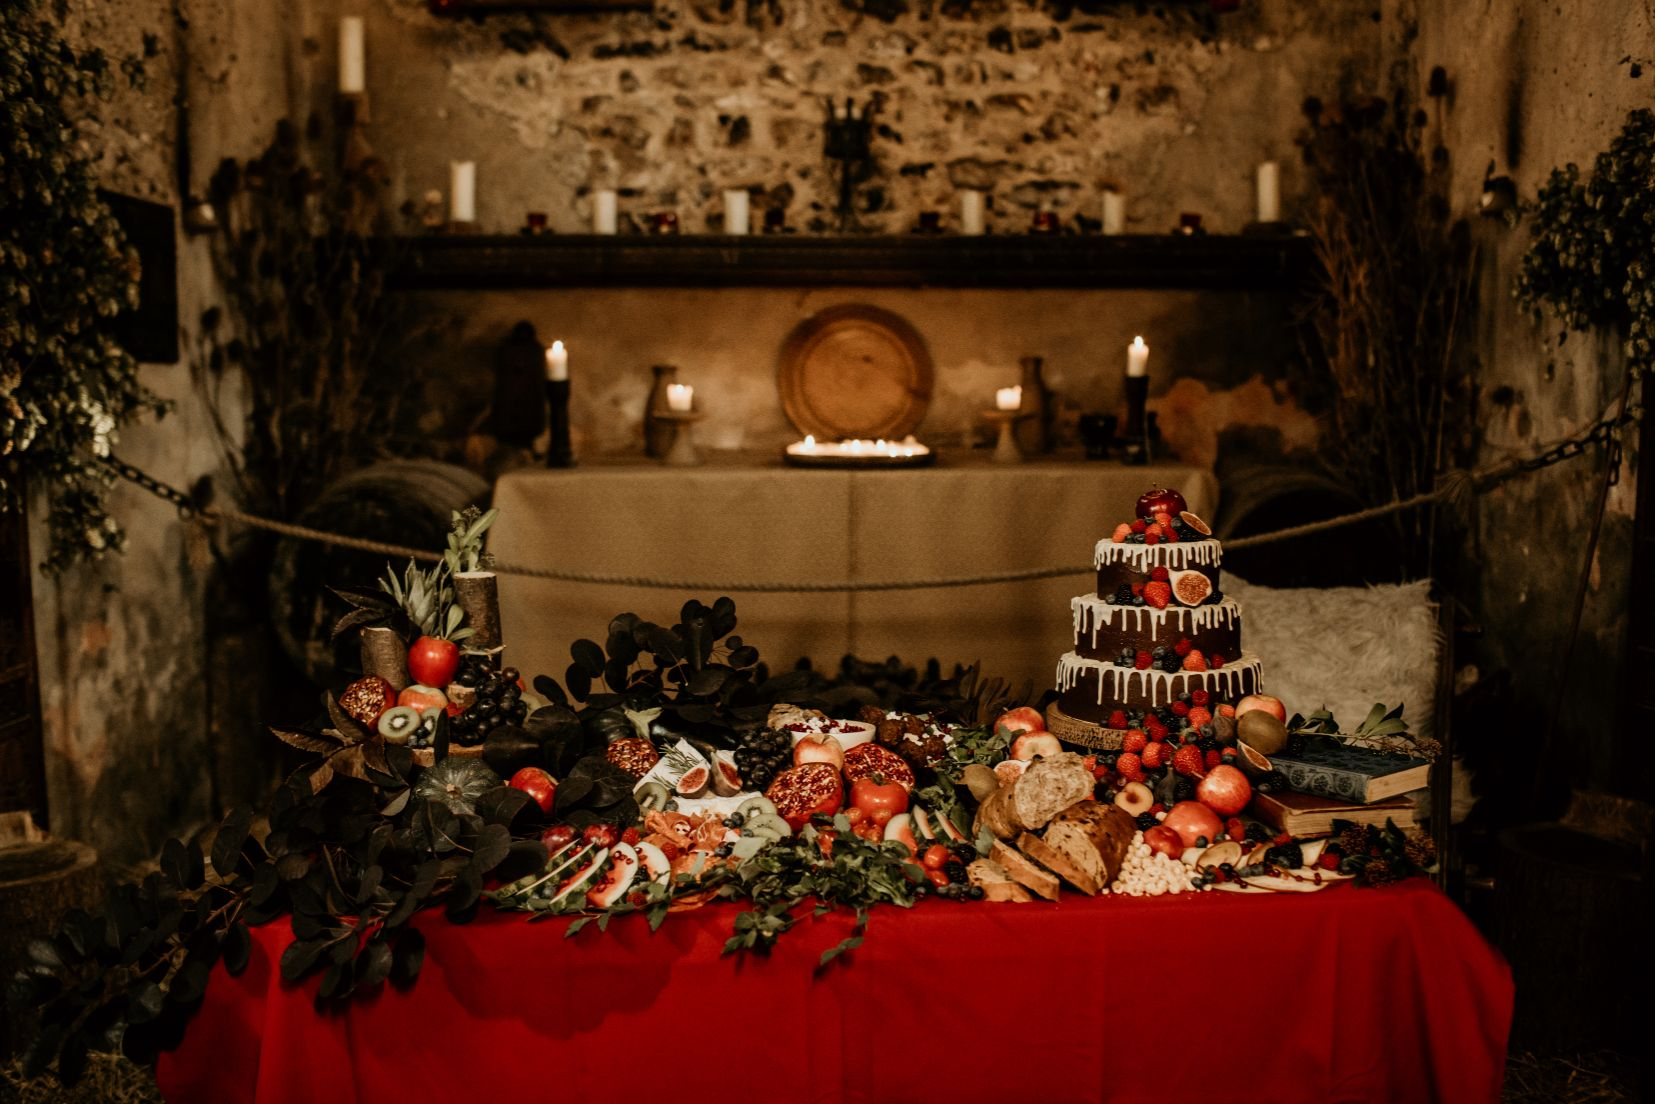 alternative fairytale wedding- snow white wedding- charlotte laurie designs-chloe mary photo- unconventional wedding- alternative wedding inspiration- wedding grazing table